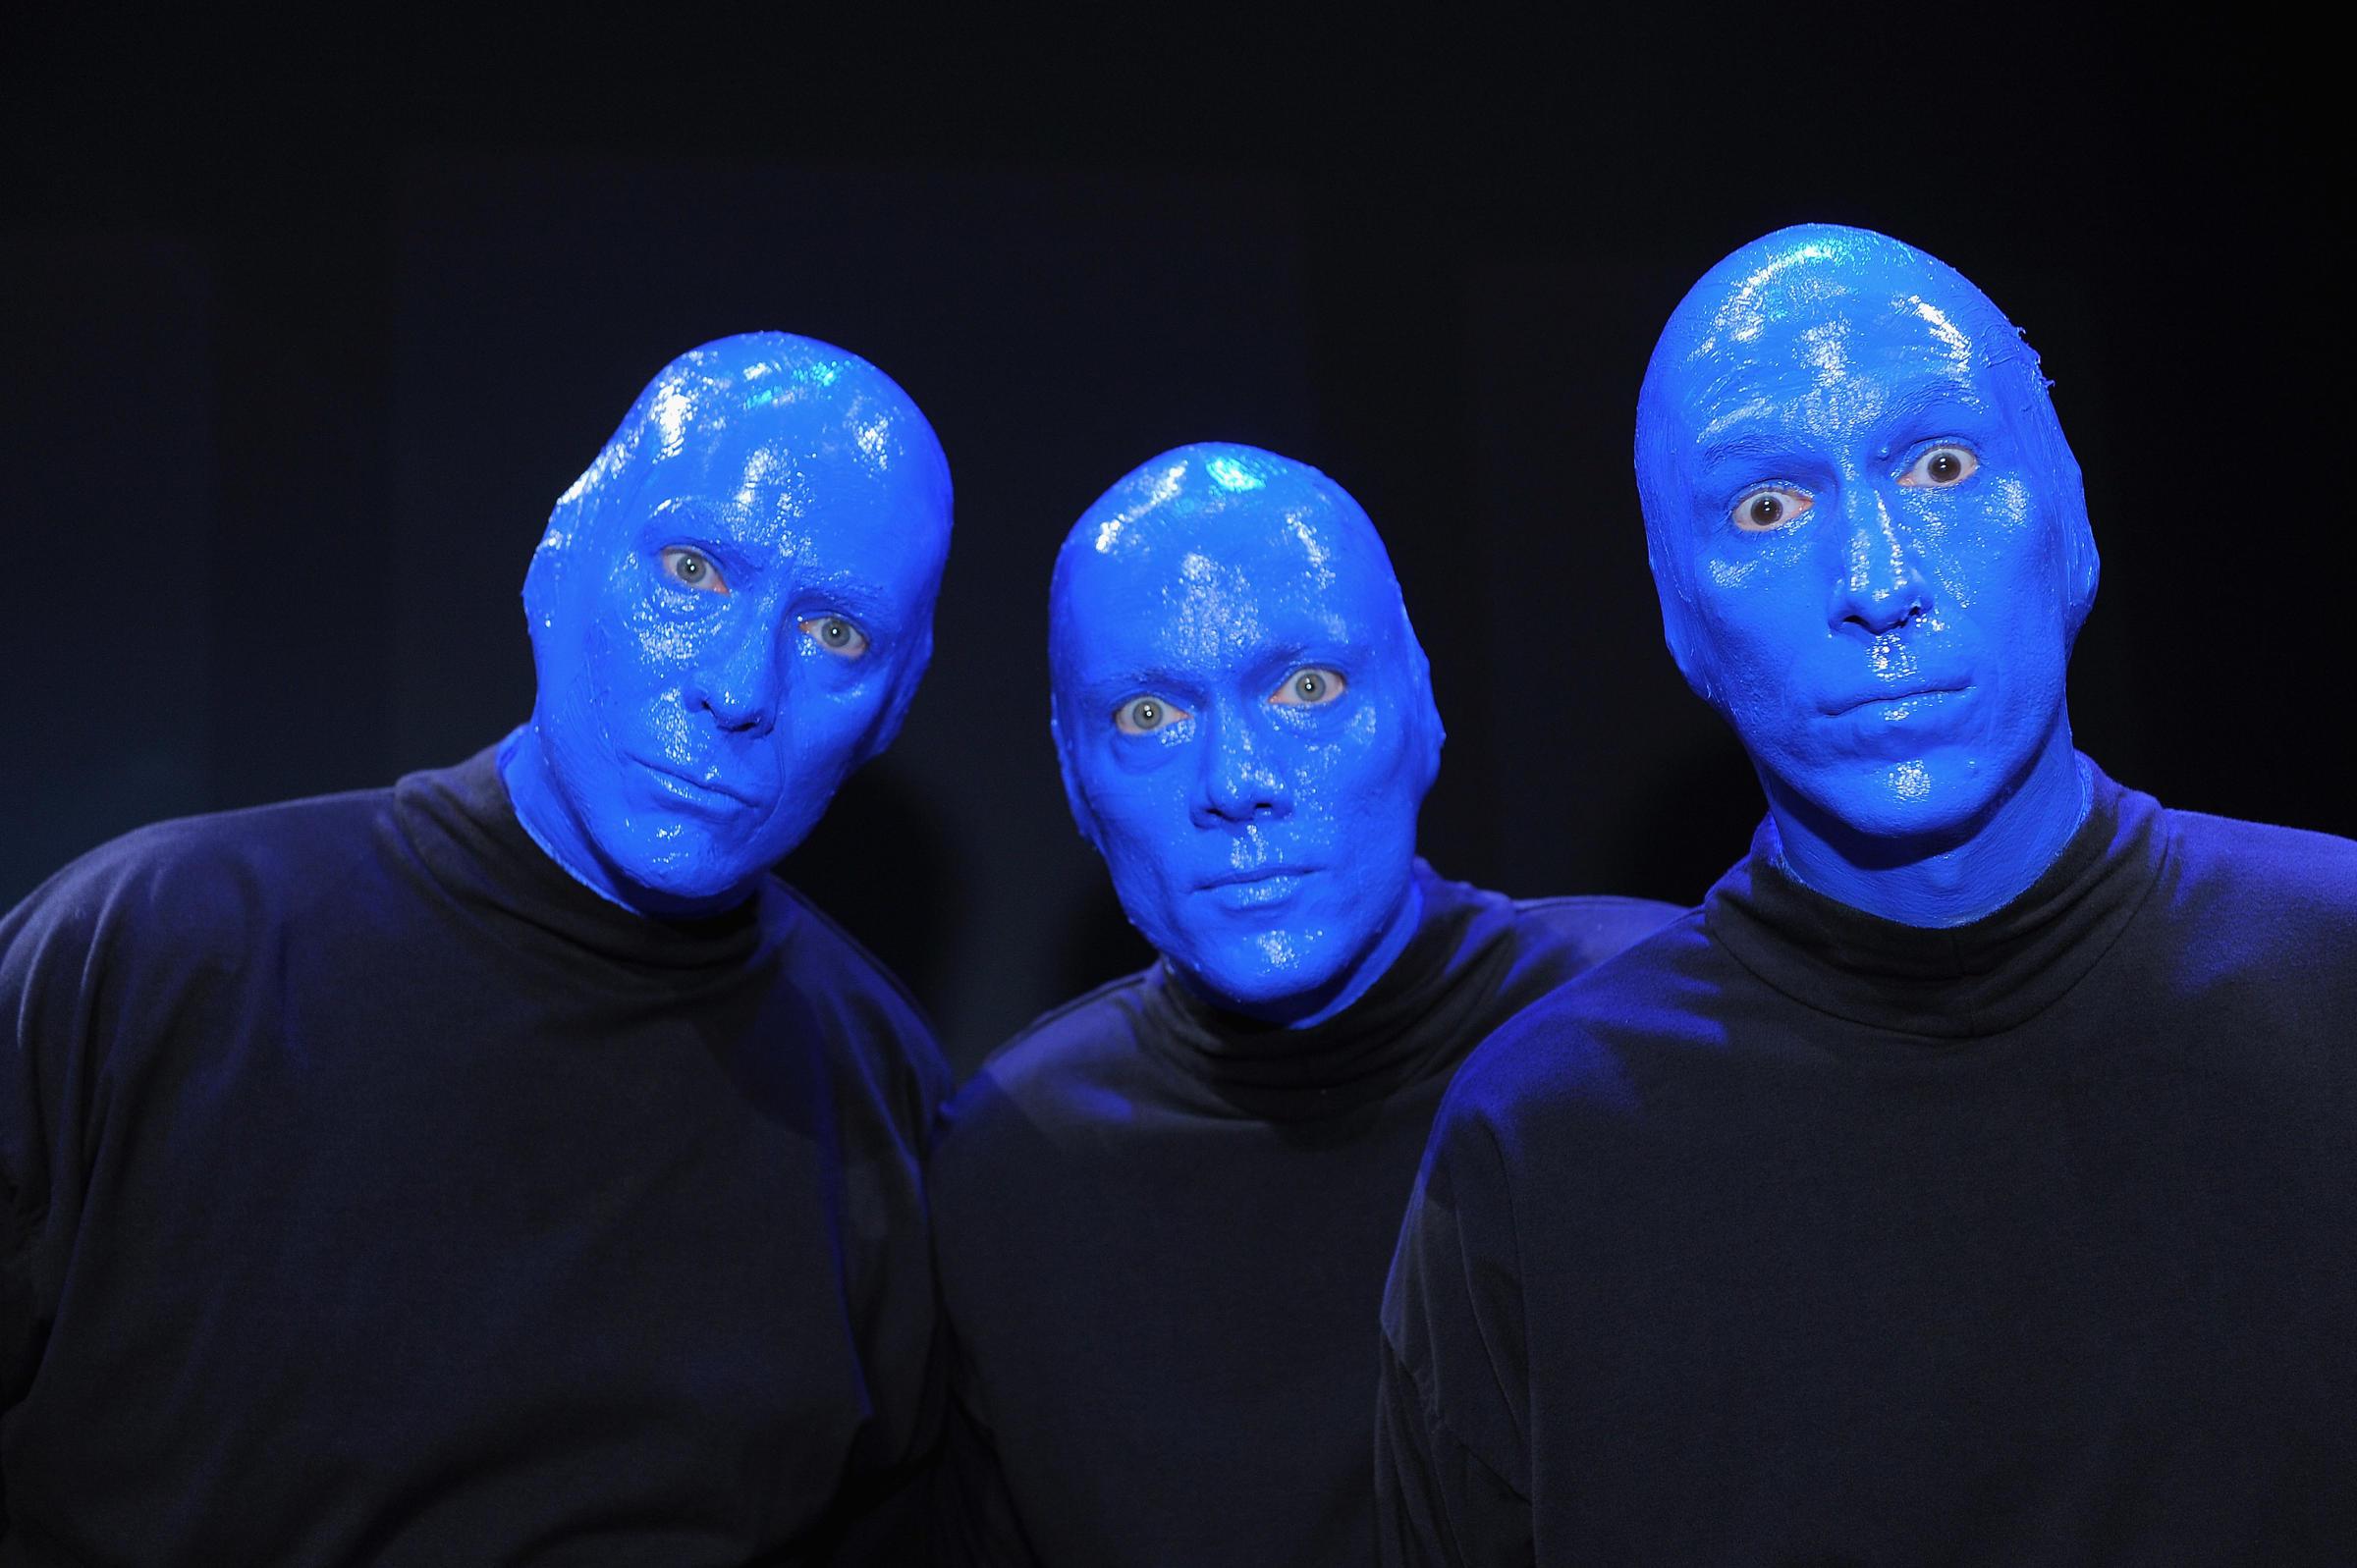 Not My Job: The Blue Man Group Turns 25 | NPR Illinois